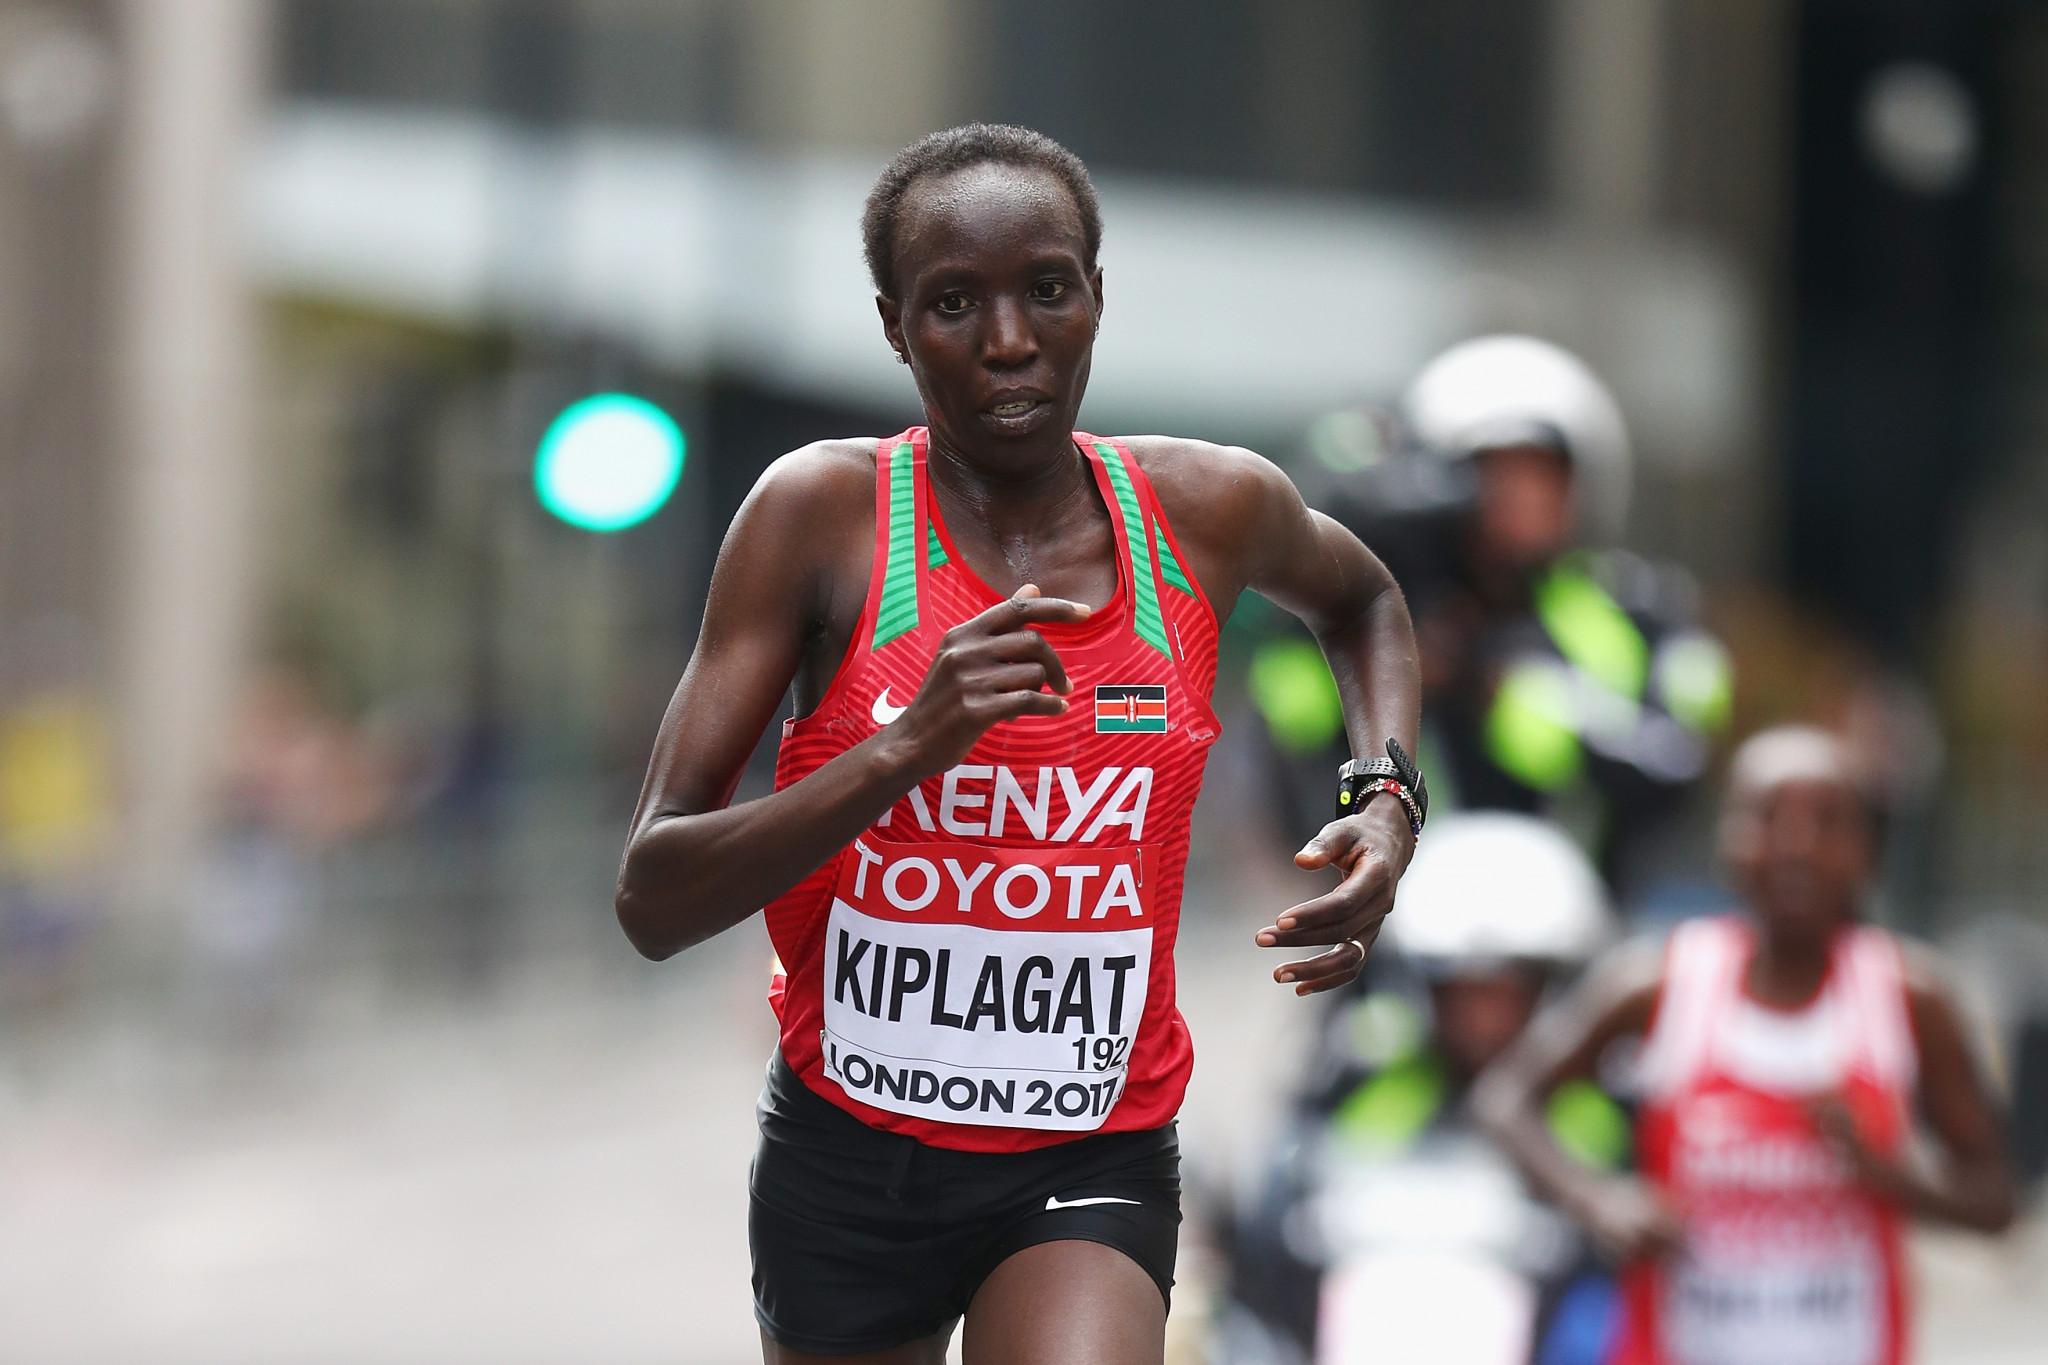 Men's and women's fields wide open at Boston Marathon as veteran Kiplagat returns